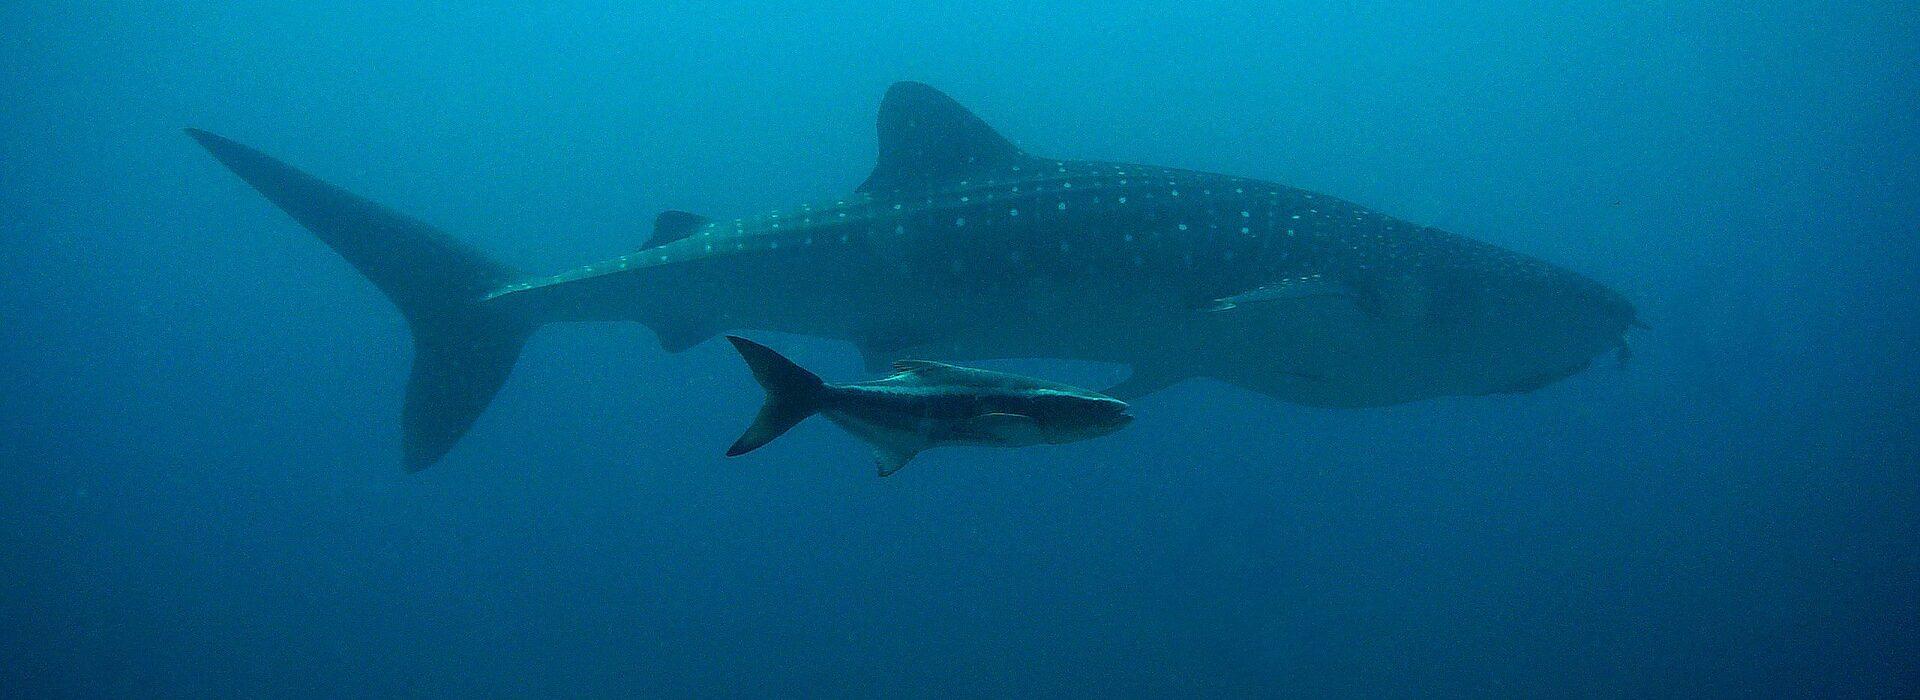 ocean noise whales